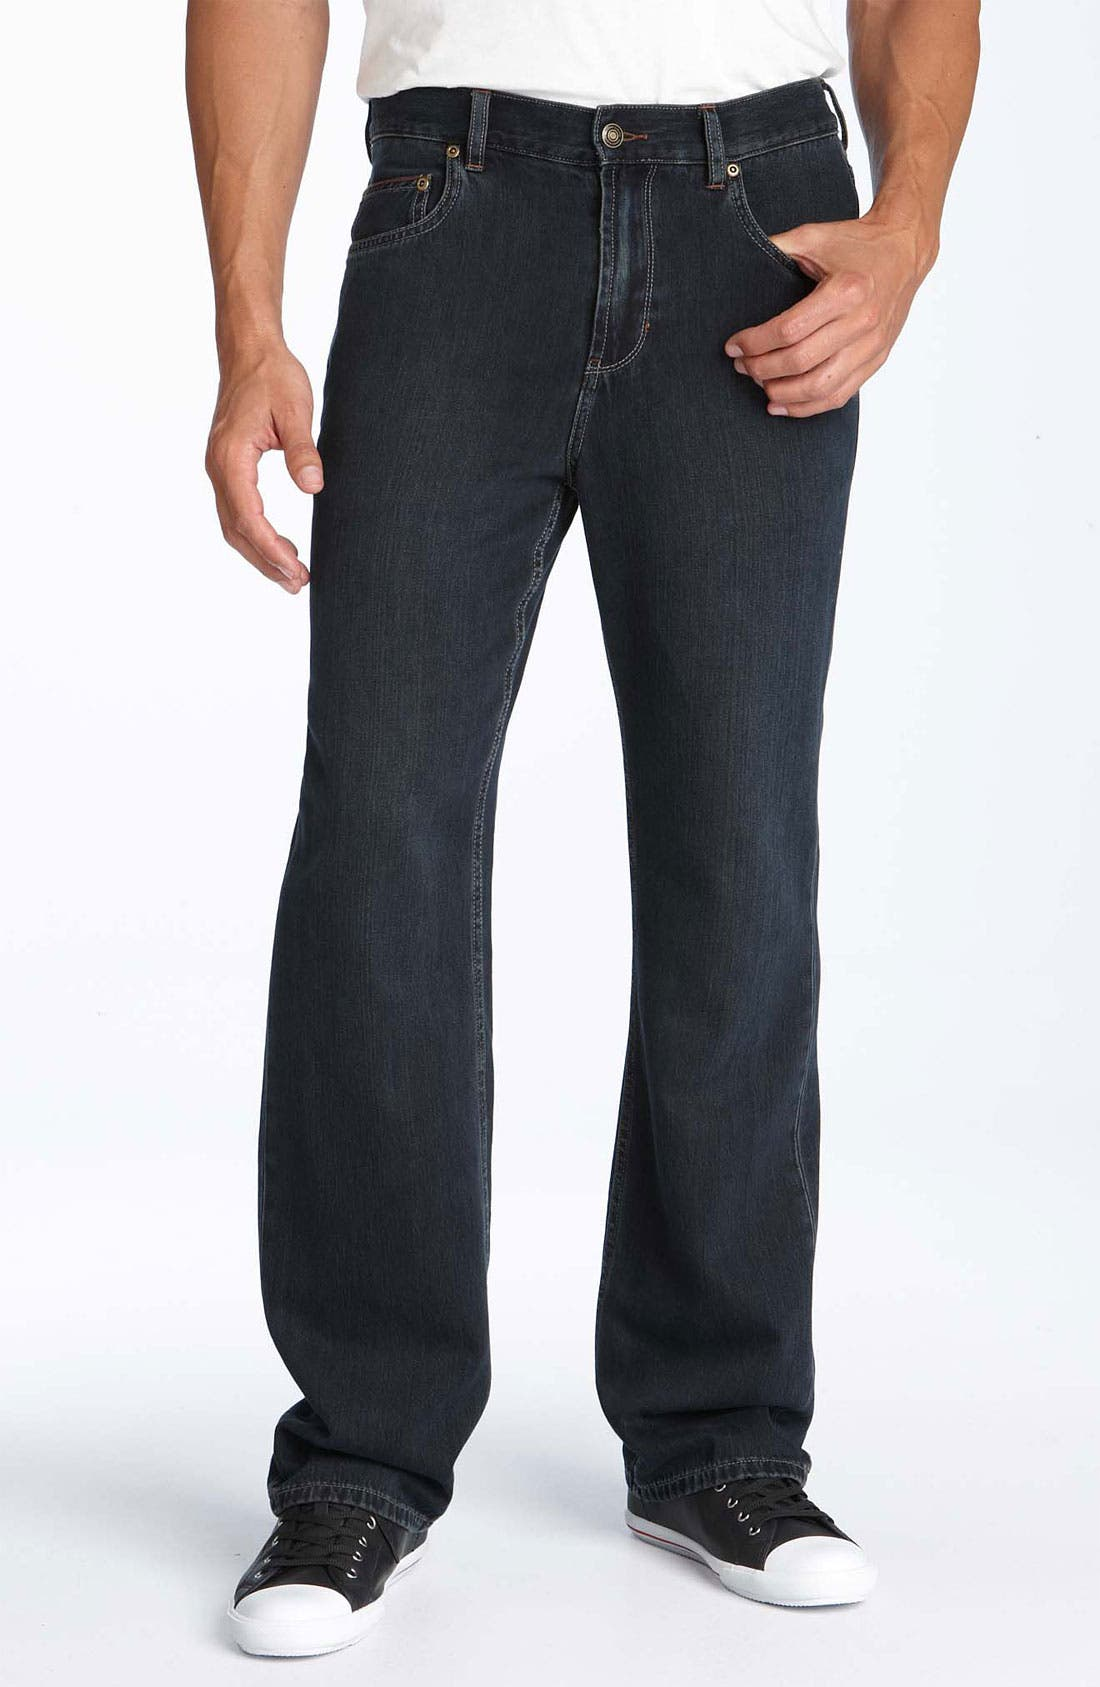 Main Image - Tommy Bahama Denim 'Island Ease' Straight Leg Jeans (Black Overdye)